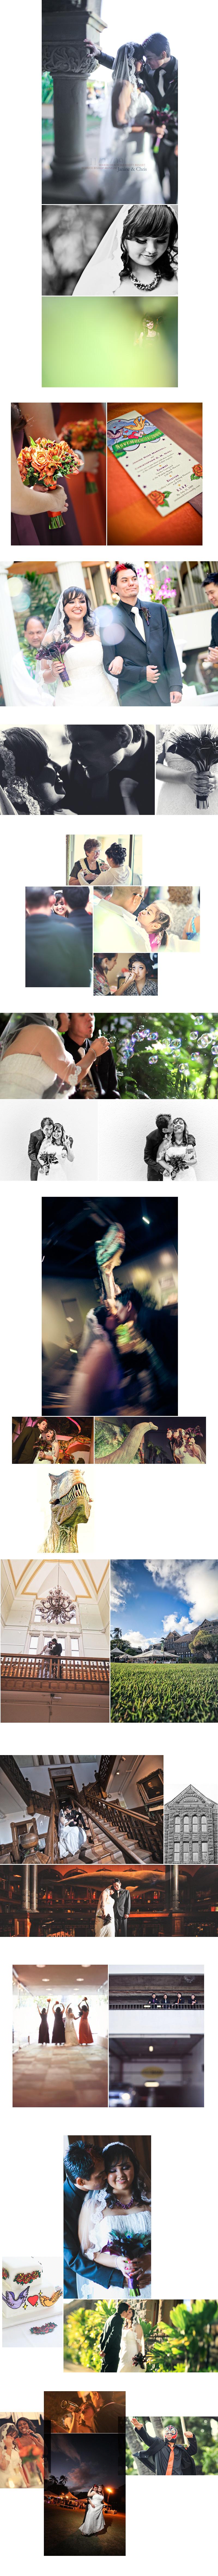 Shawn Starr : Modern Wedding Photography : Pittsburgh Wedding Photographer : Bishop Museum